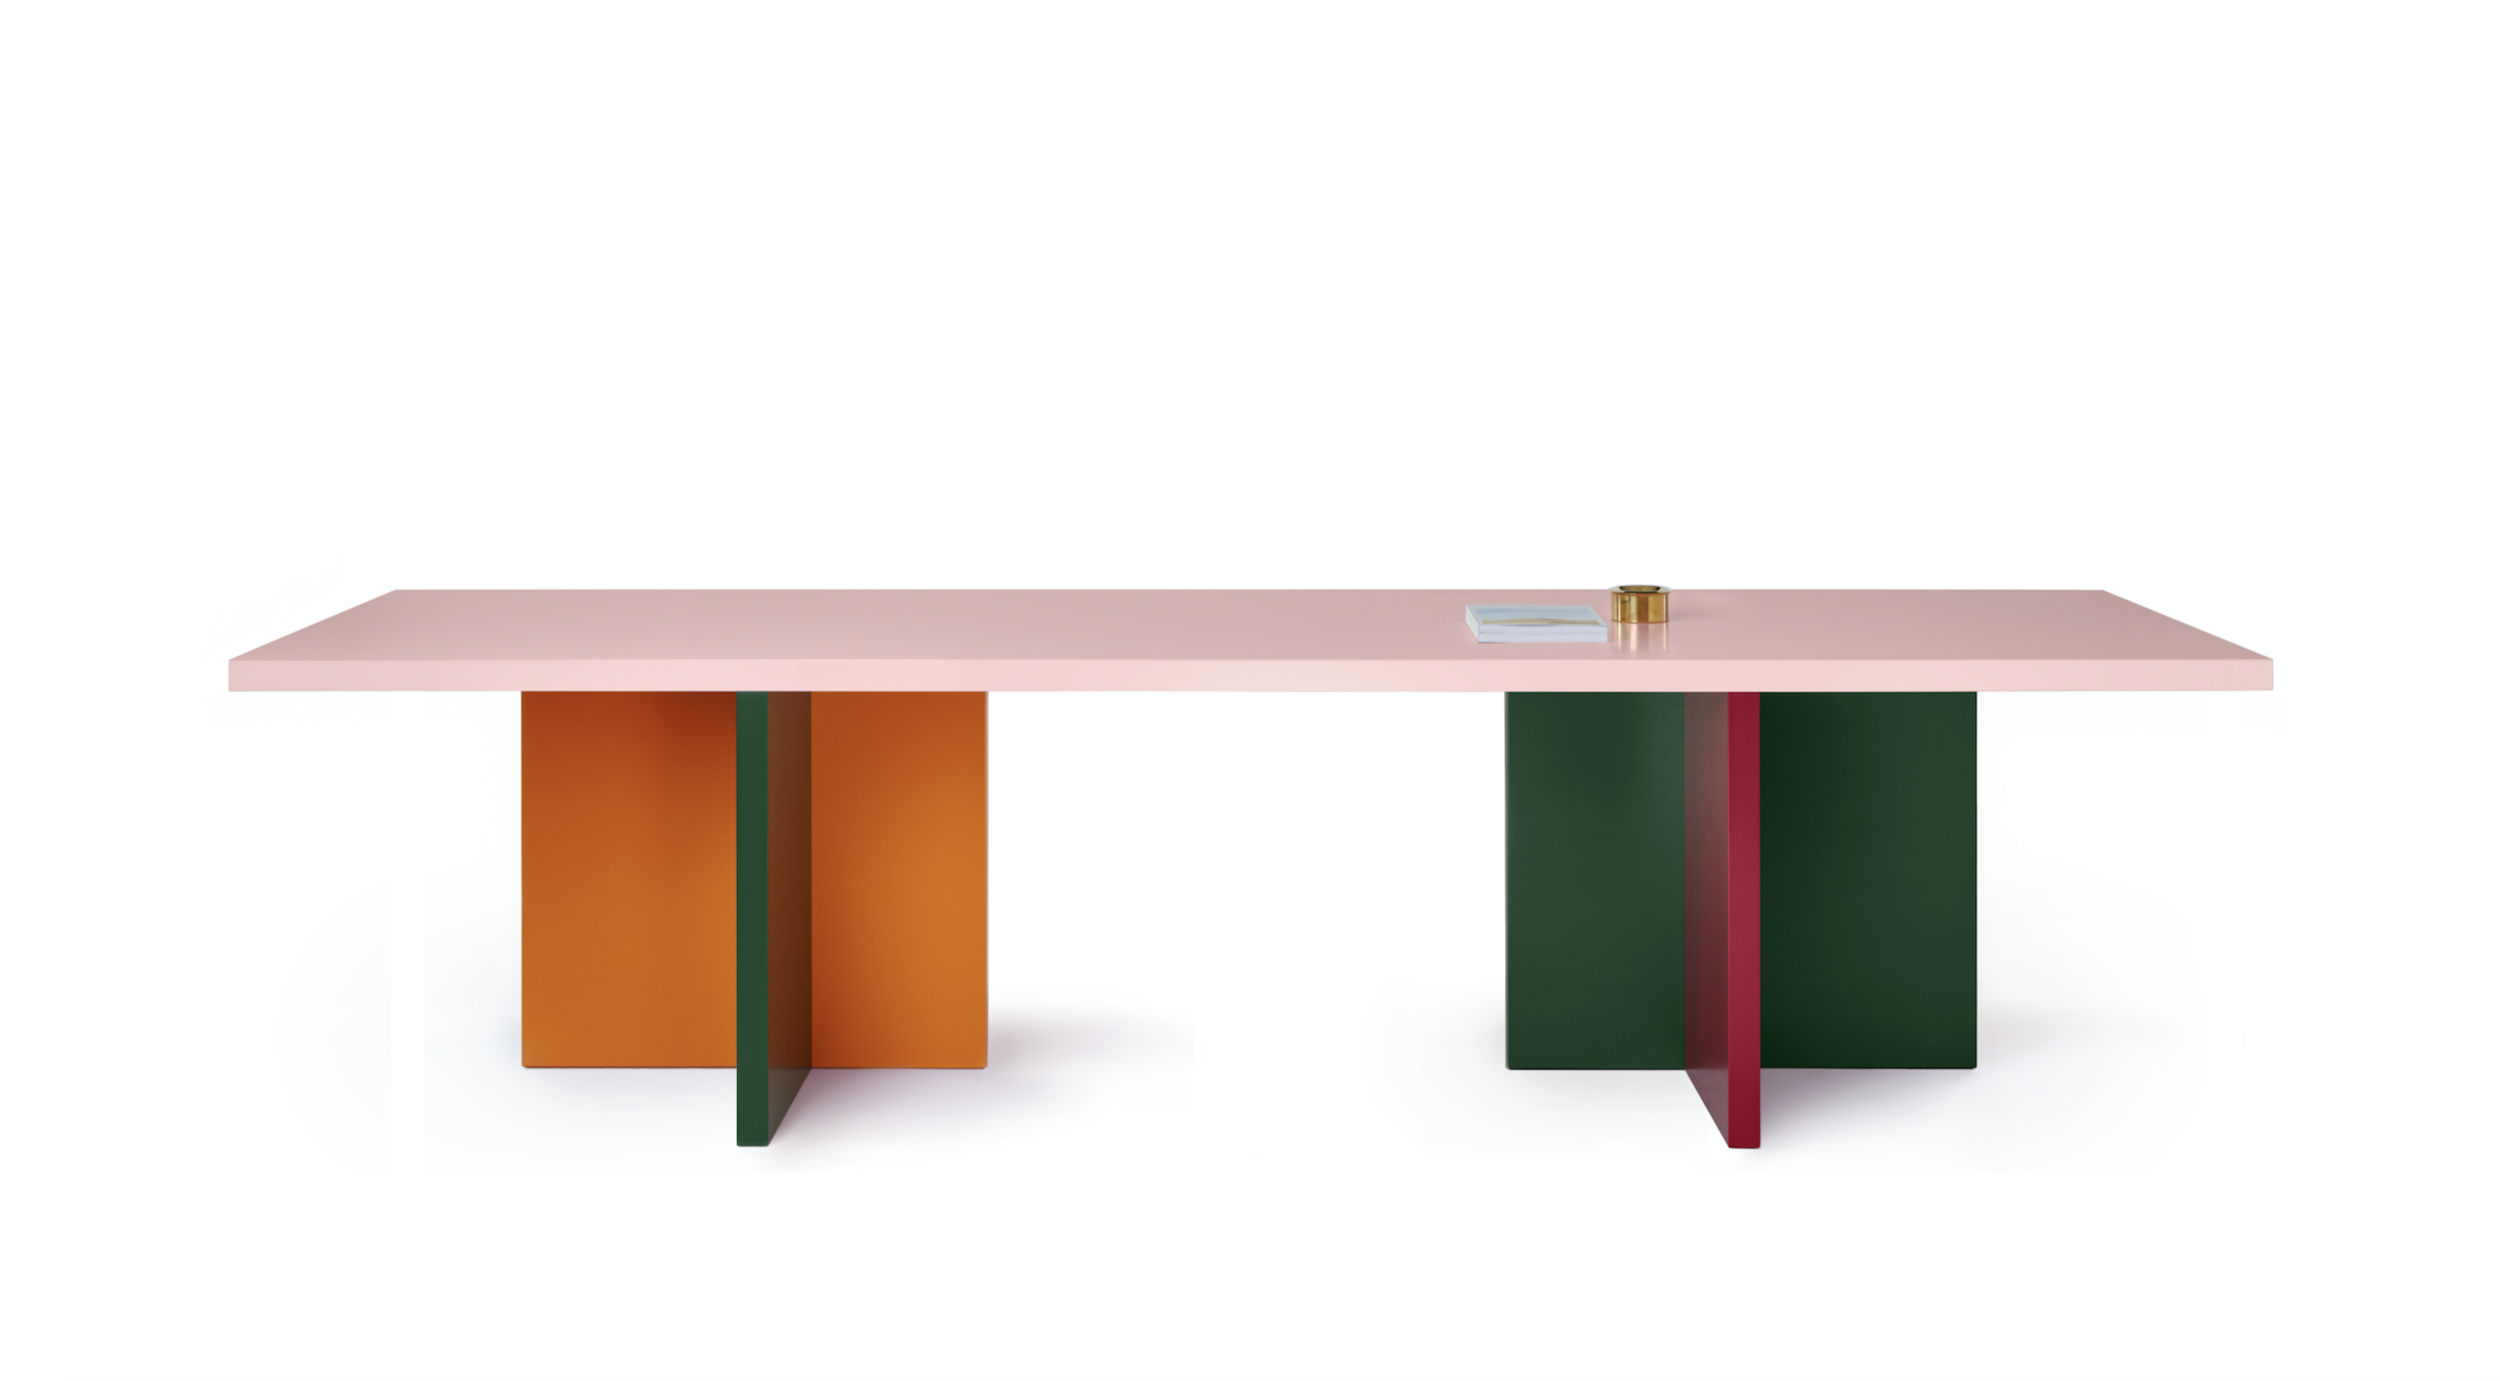 ABBONDIO table / Pic by Ragnar Schmuck